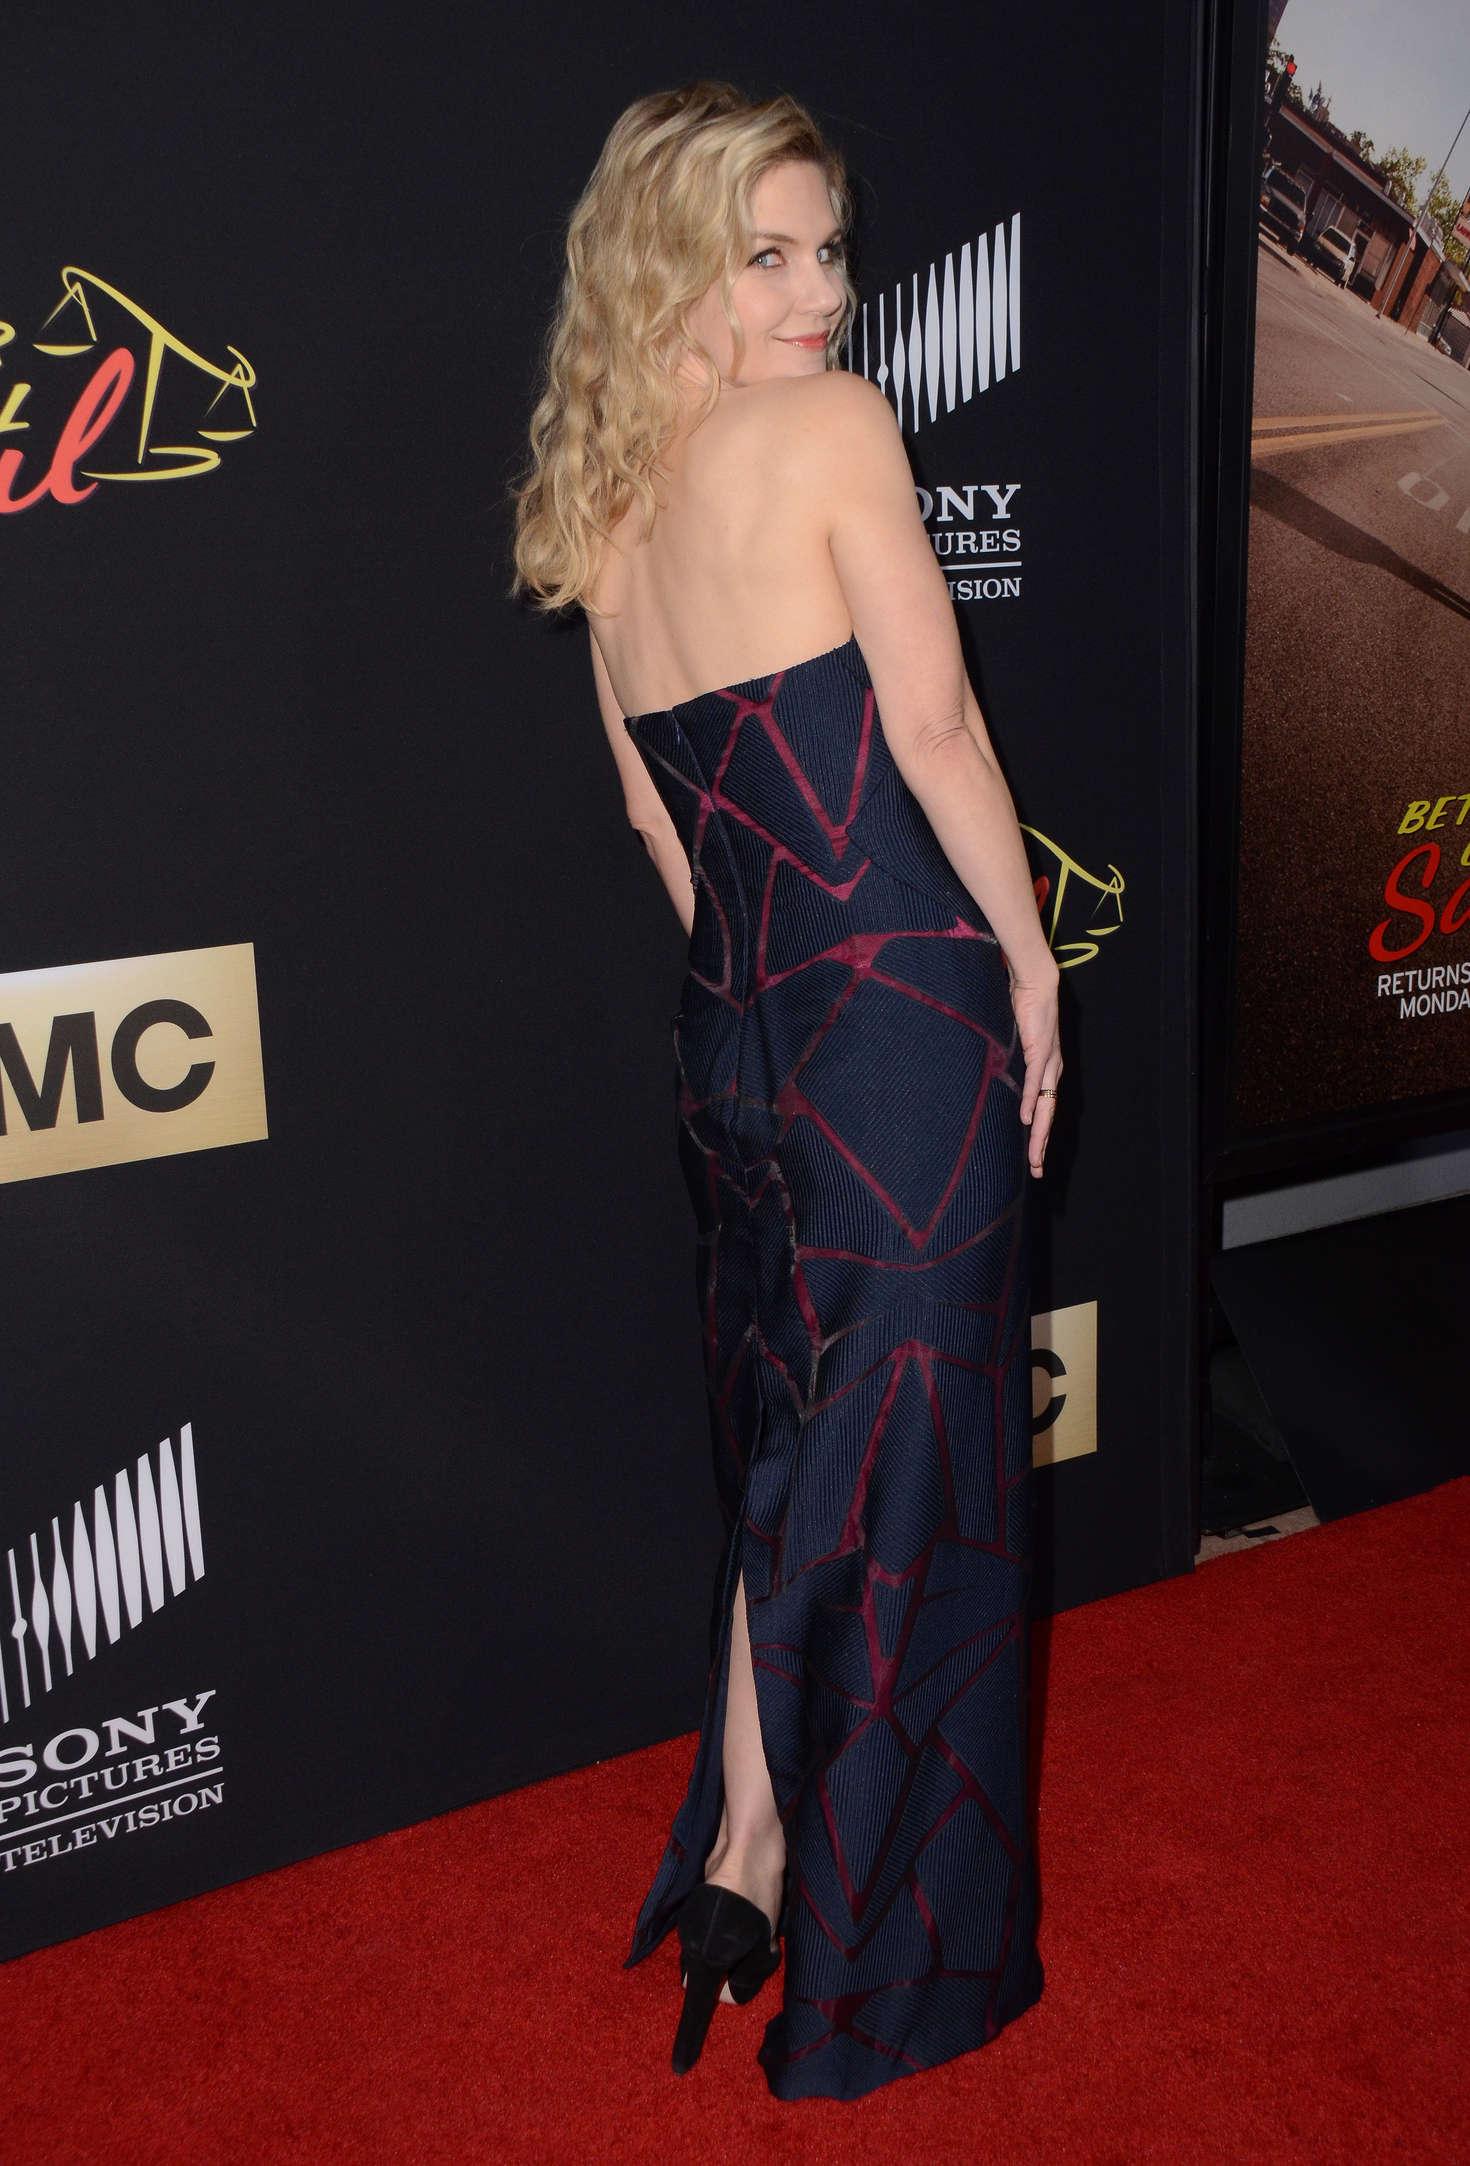 Rhea Seehorn Better Call Saul Season Two Screening in Los Angeles